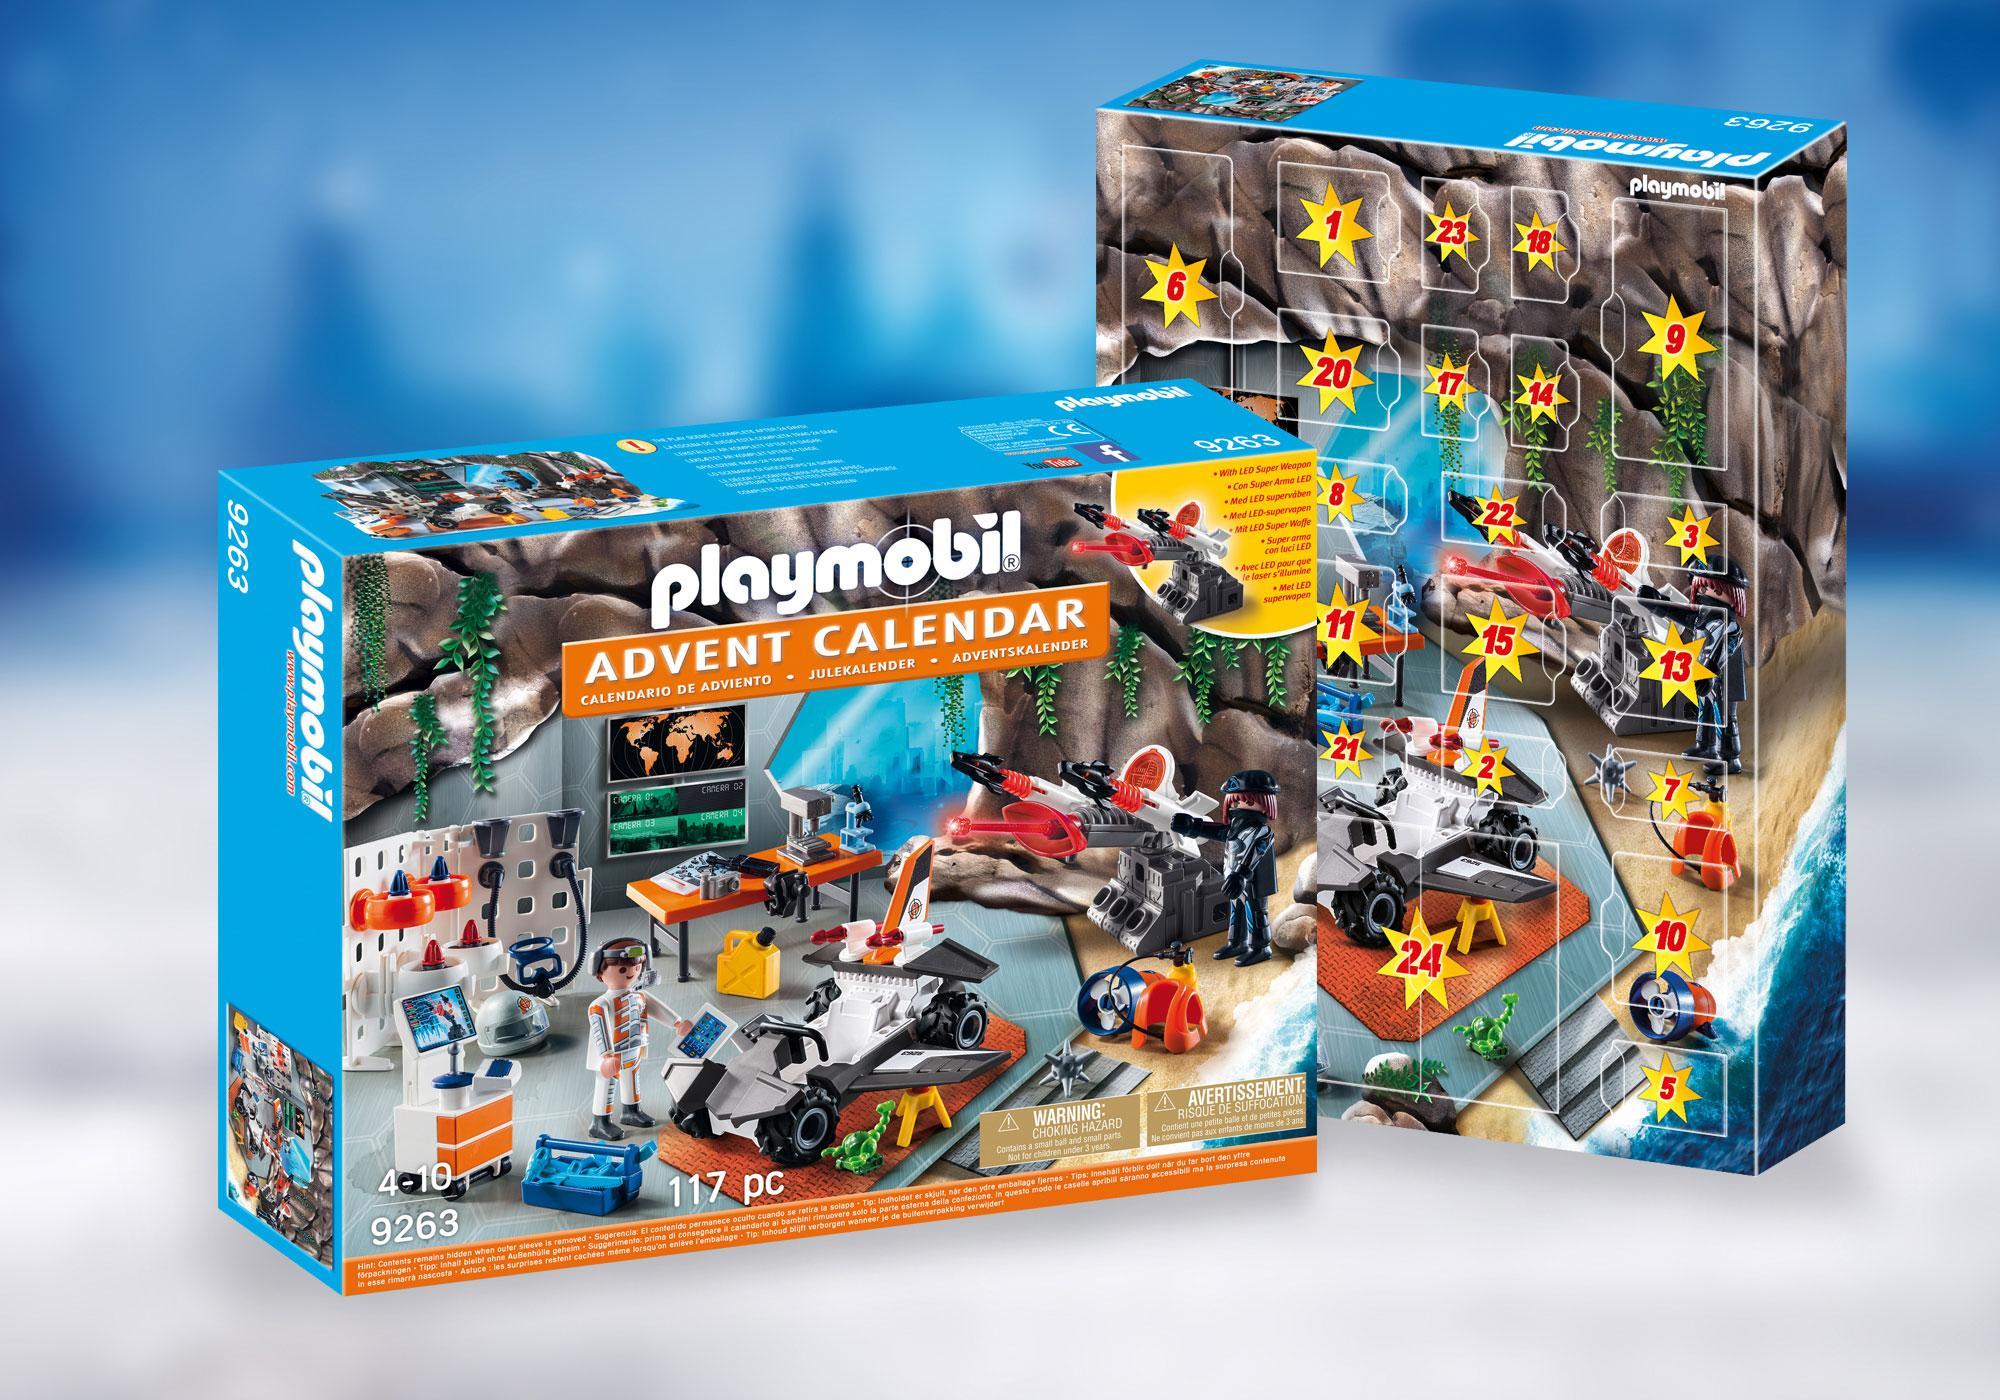 http://media.playmobil.com/i/playmobil/9263_product_detail/Advent Calendar - Top Agents